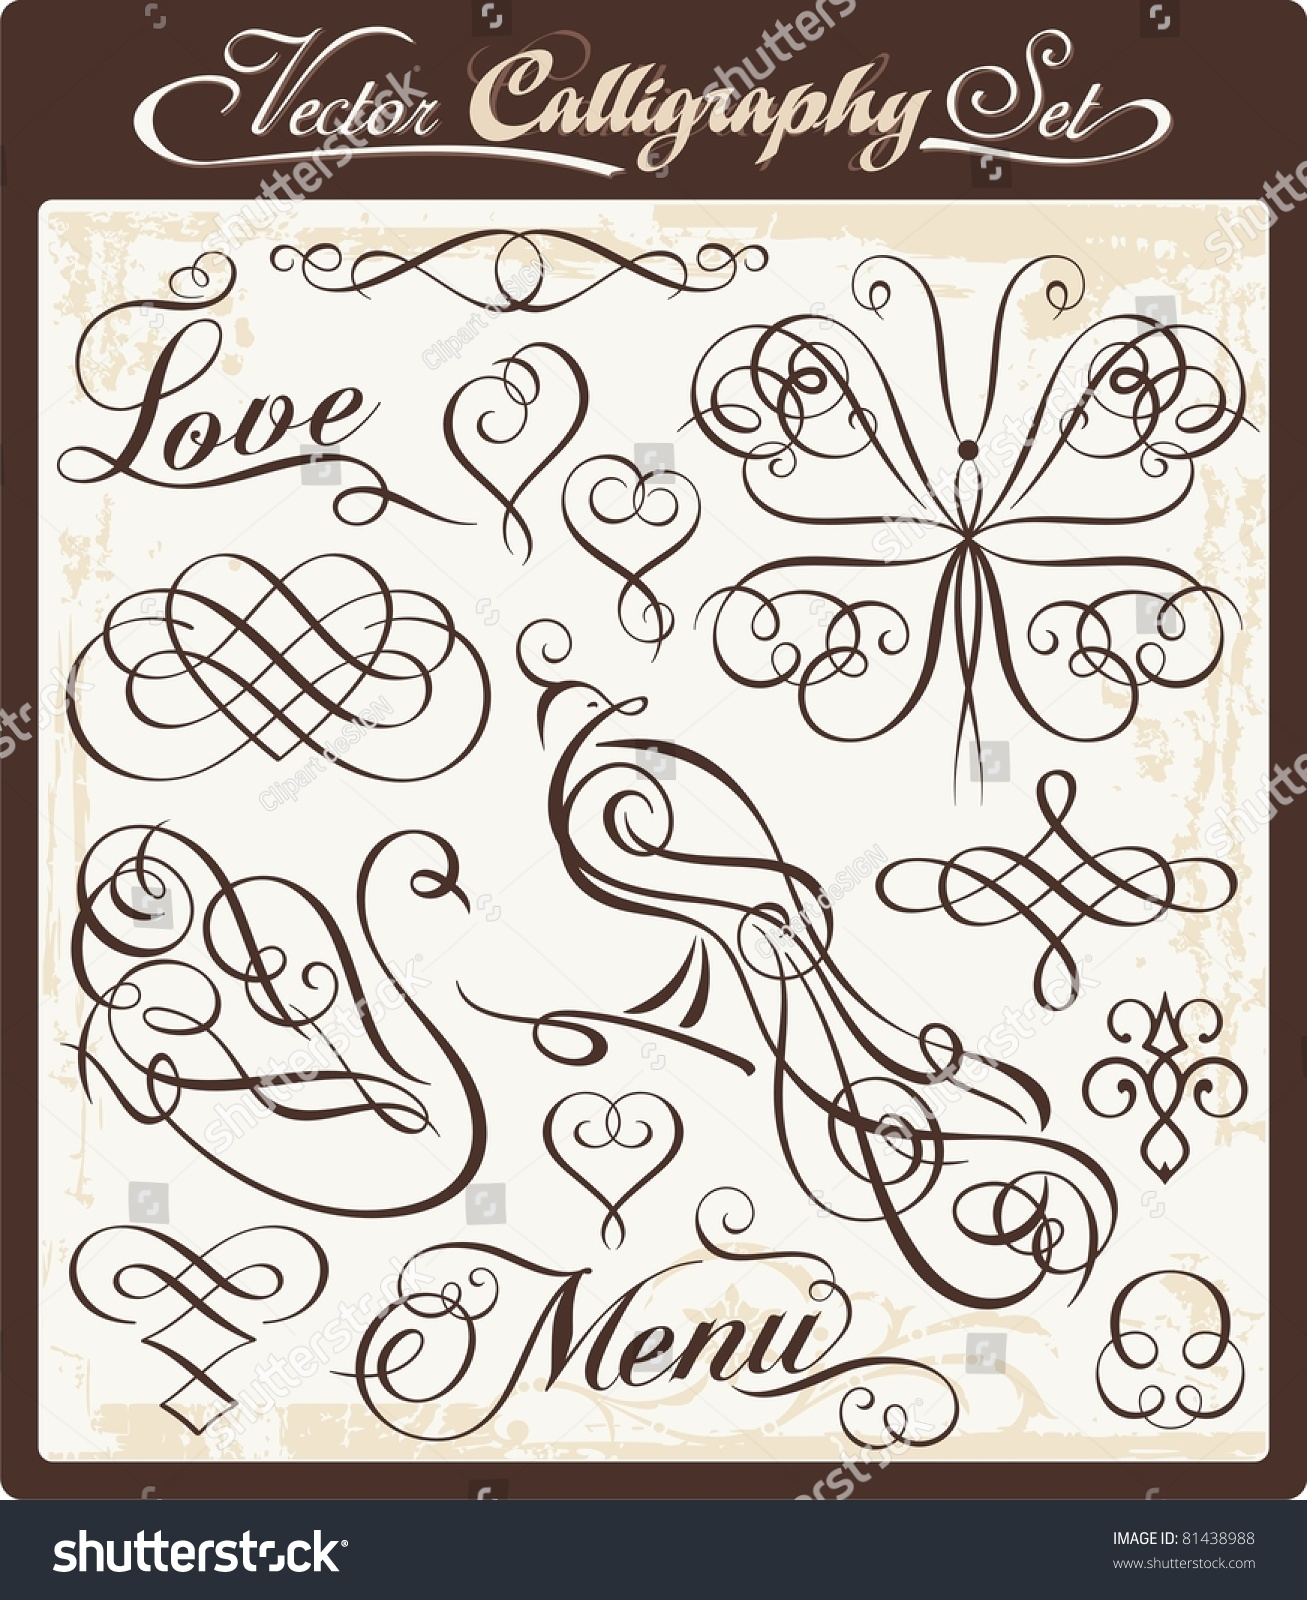 vector set exquisite calligraphic ornamental designs stock vector